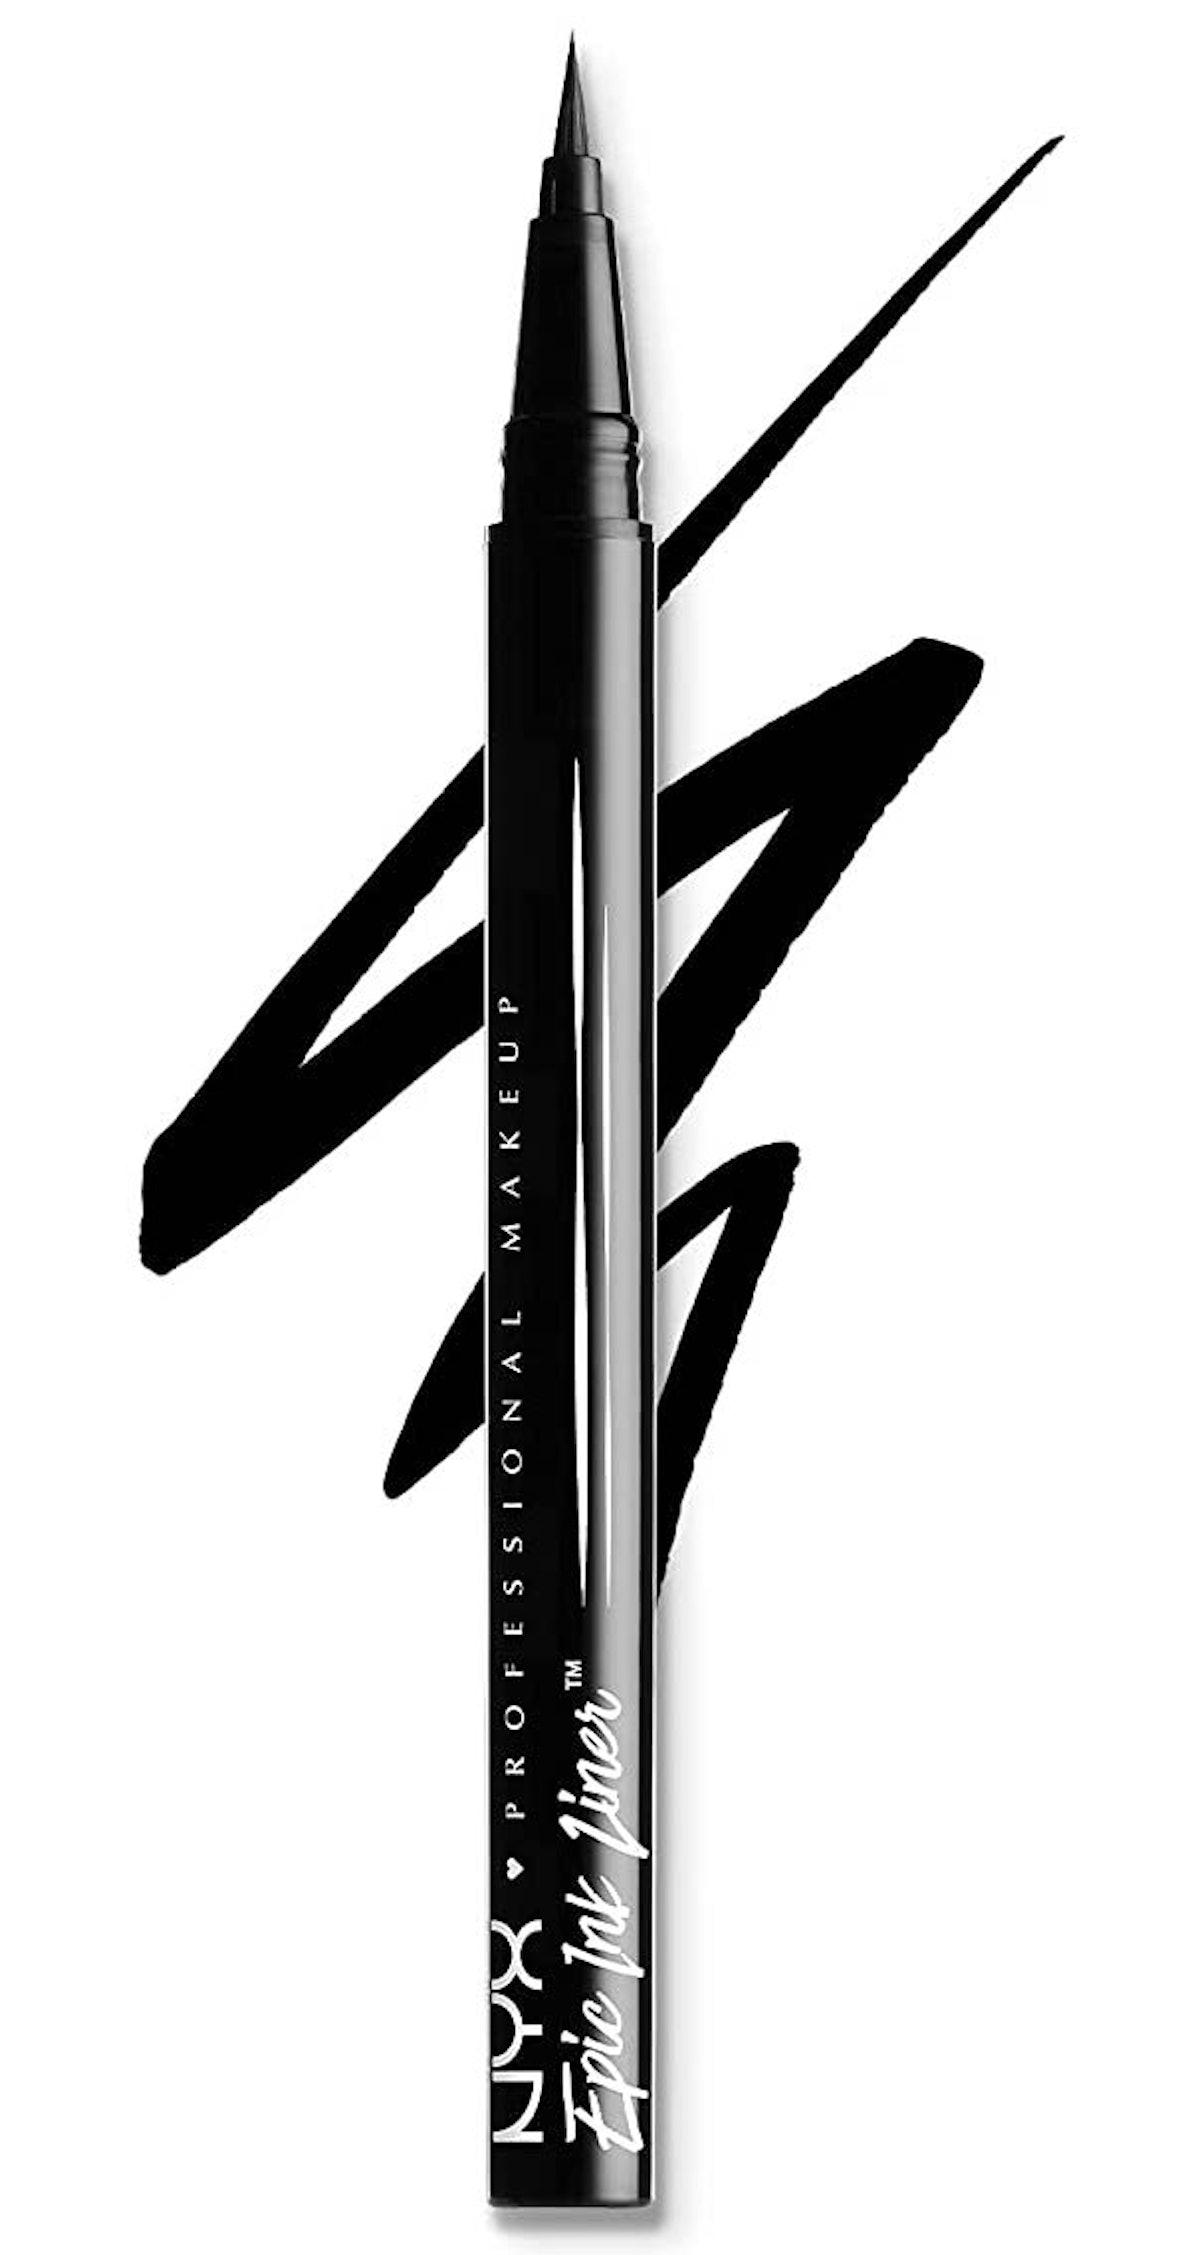 NYX Epic Waterproof Liquid Eyeliner